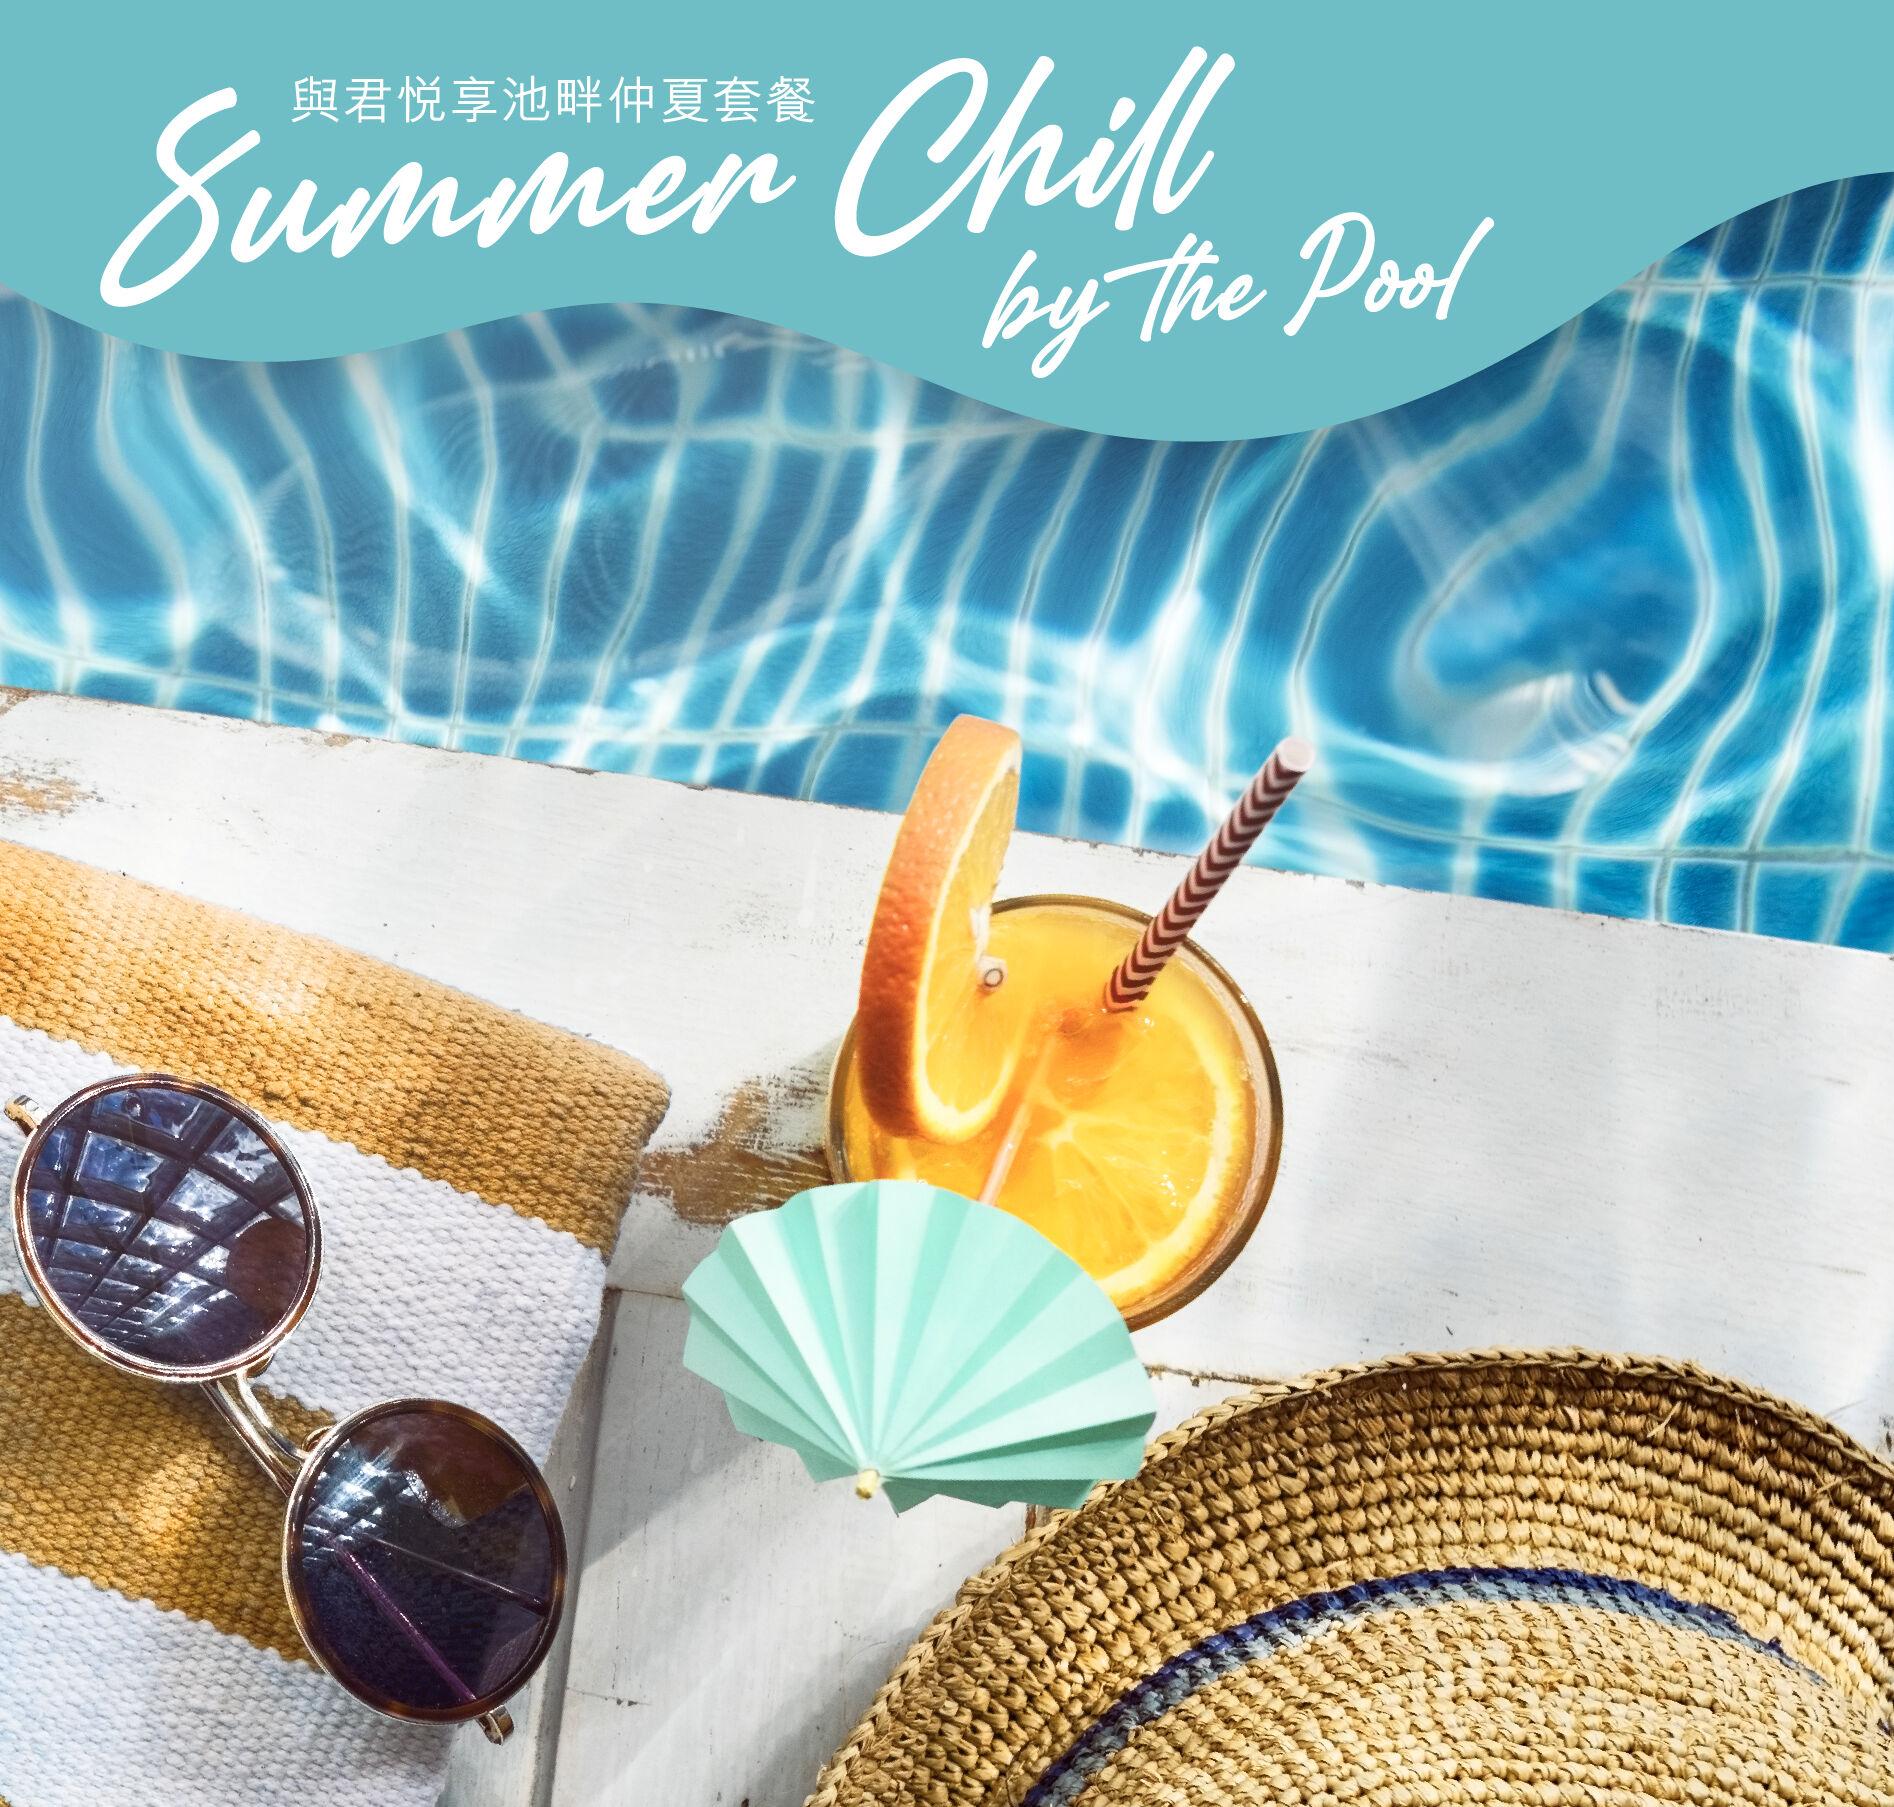 Summer Chill by the Pool Grand Hyatt Macau Poster